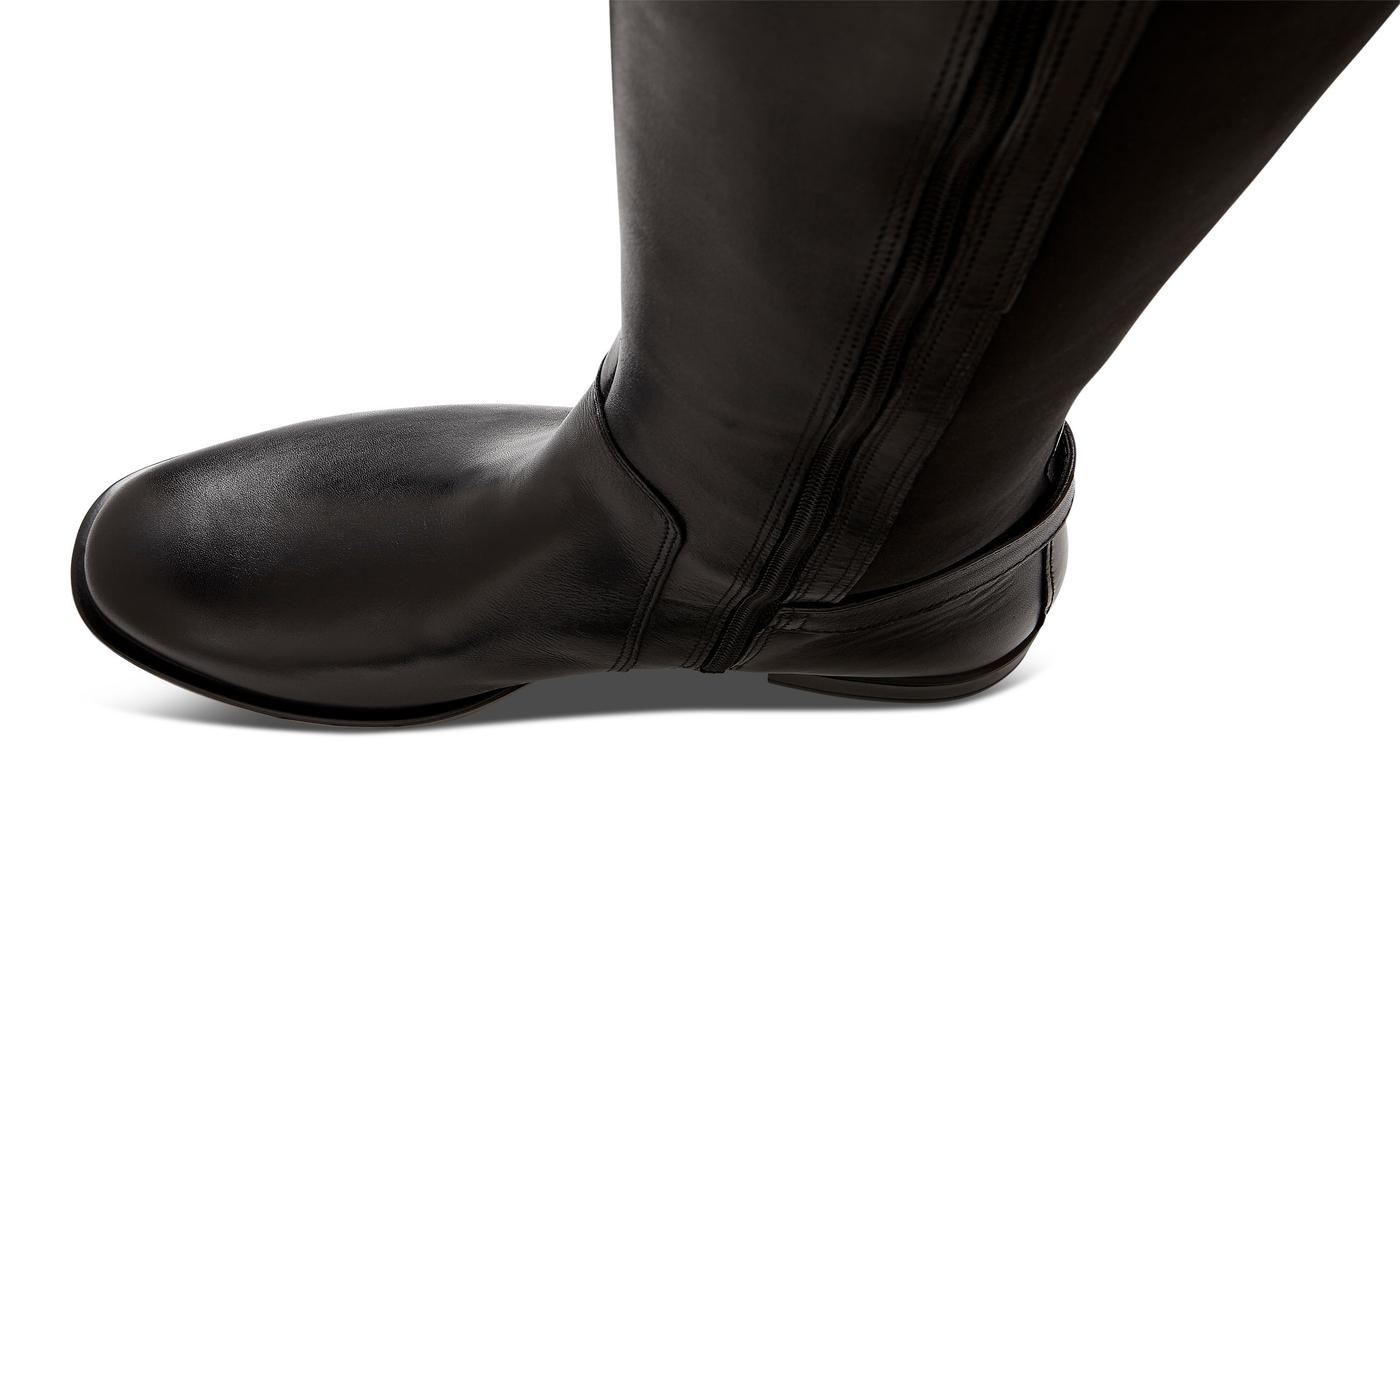 ECCO Shape M 15 Tall Boot